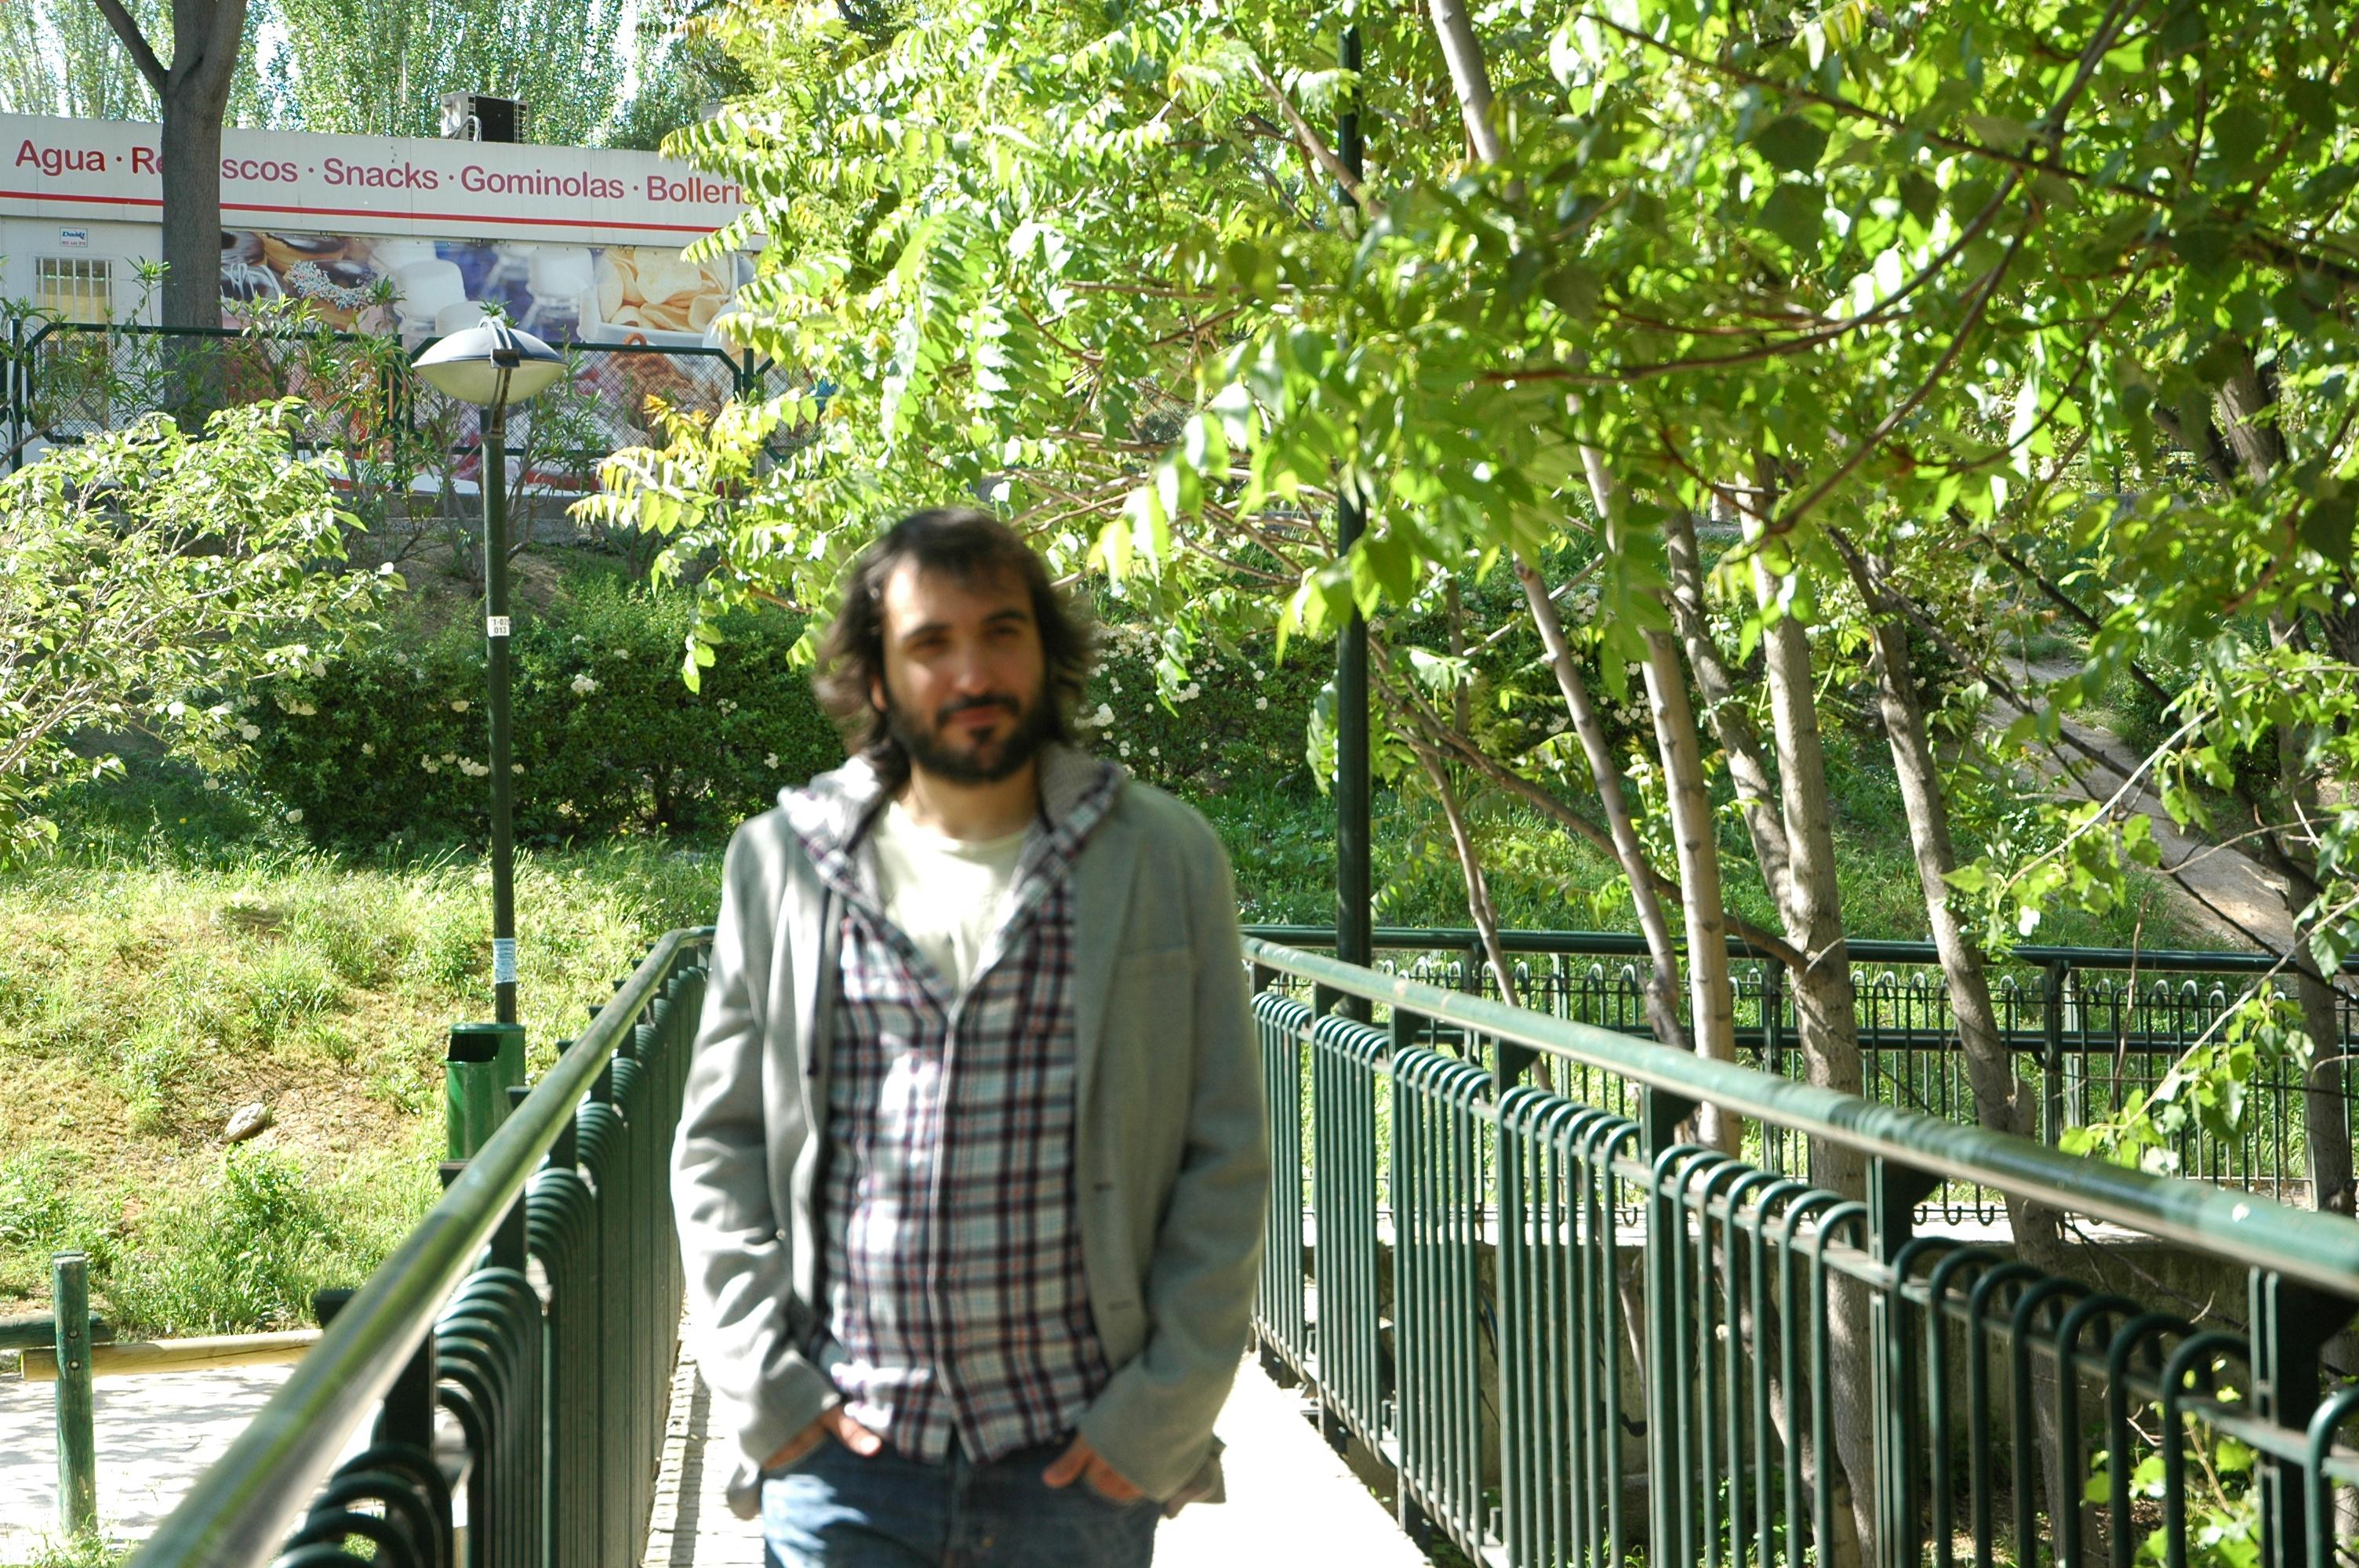 Book_1_David_Pallás_Gozalo_Parque_77